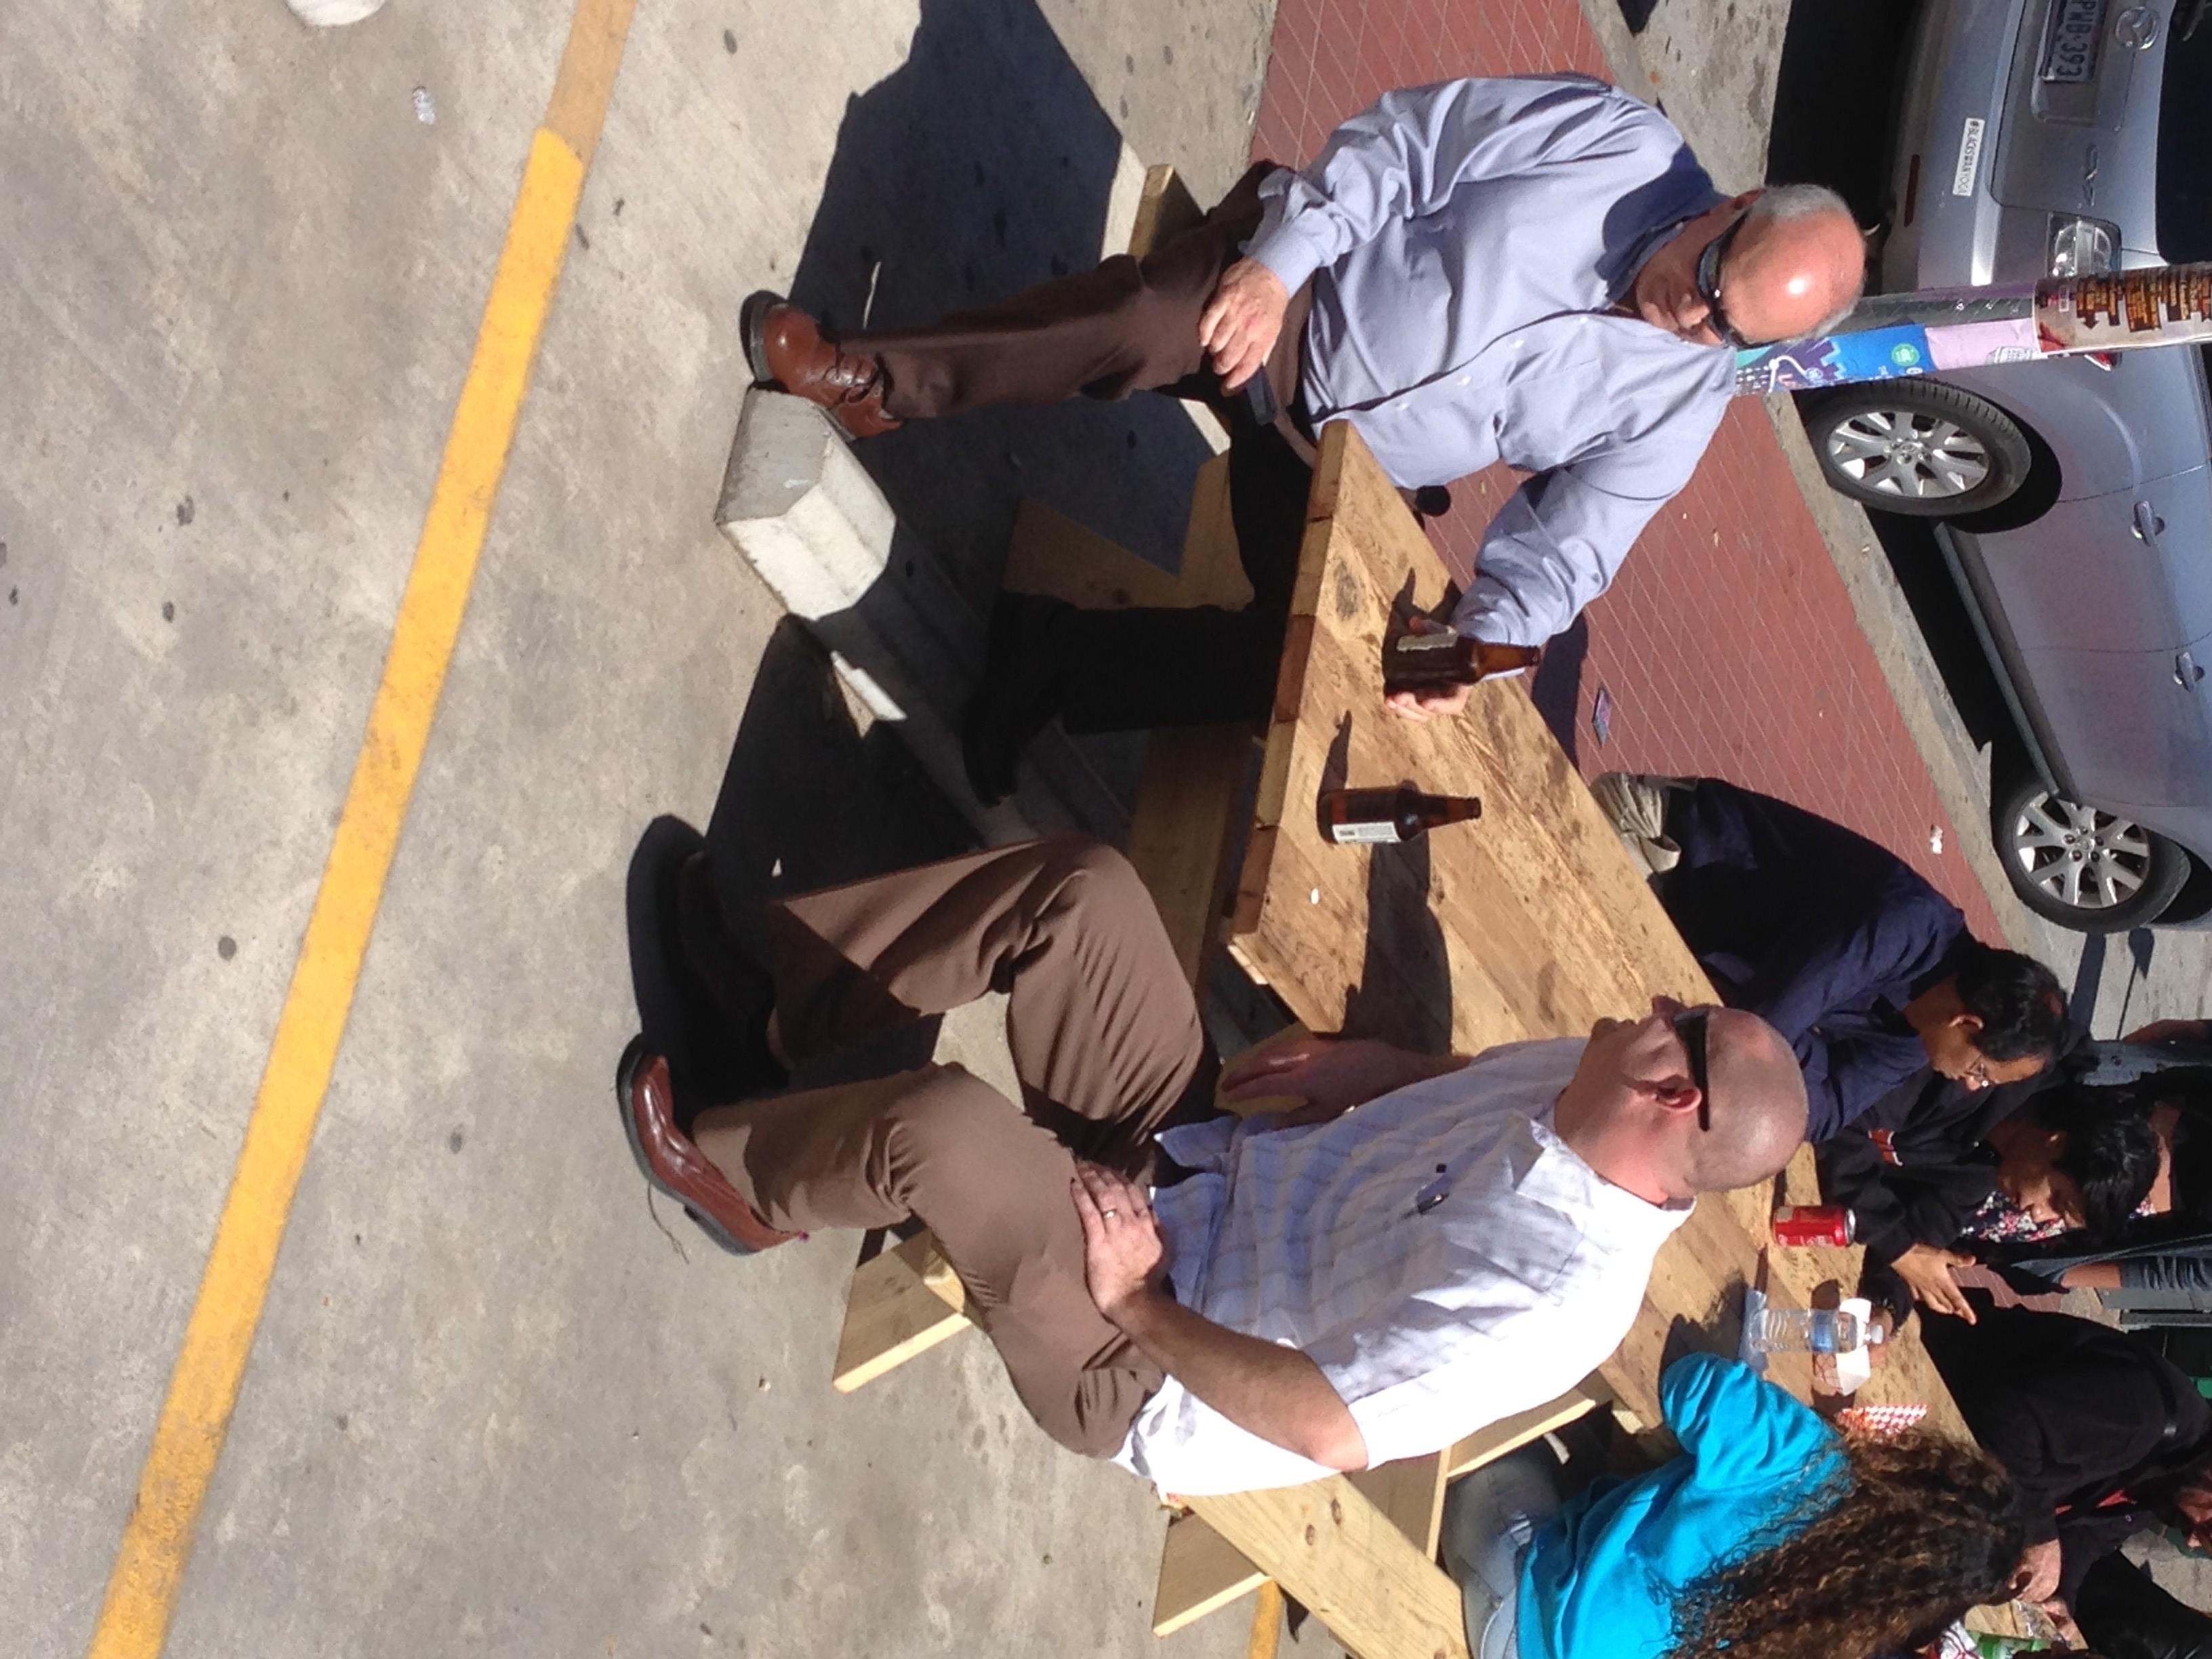 Lagunitas is so good it made these dudes love our hippie van.